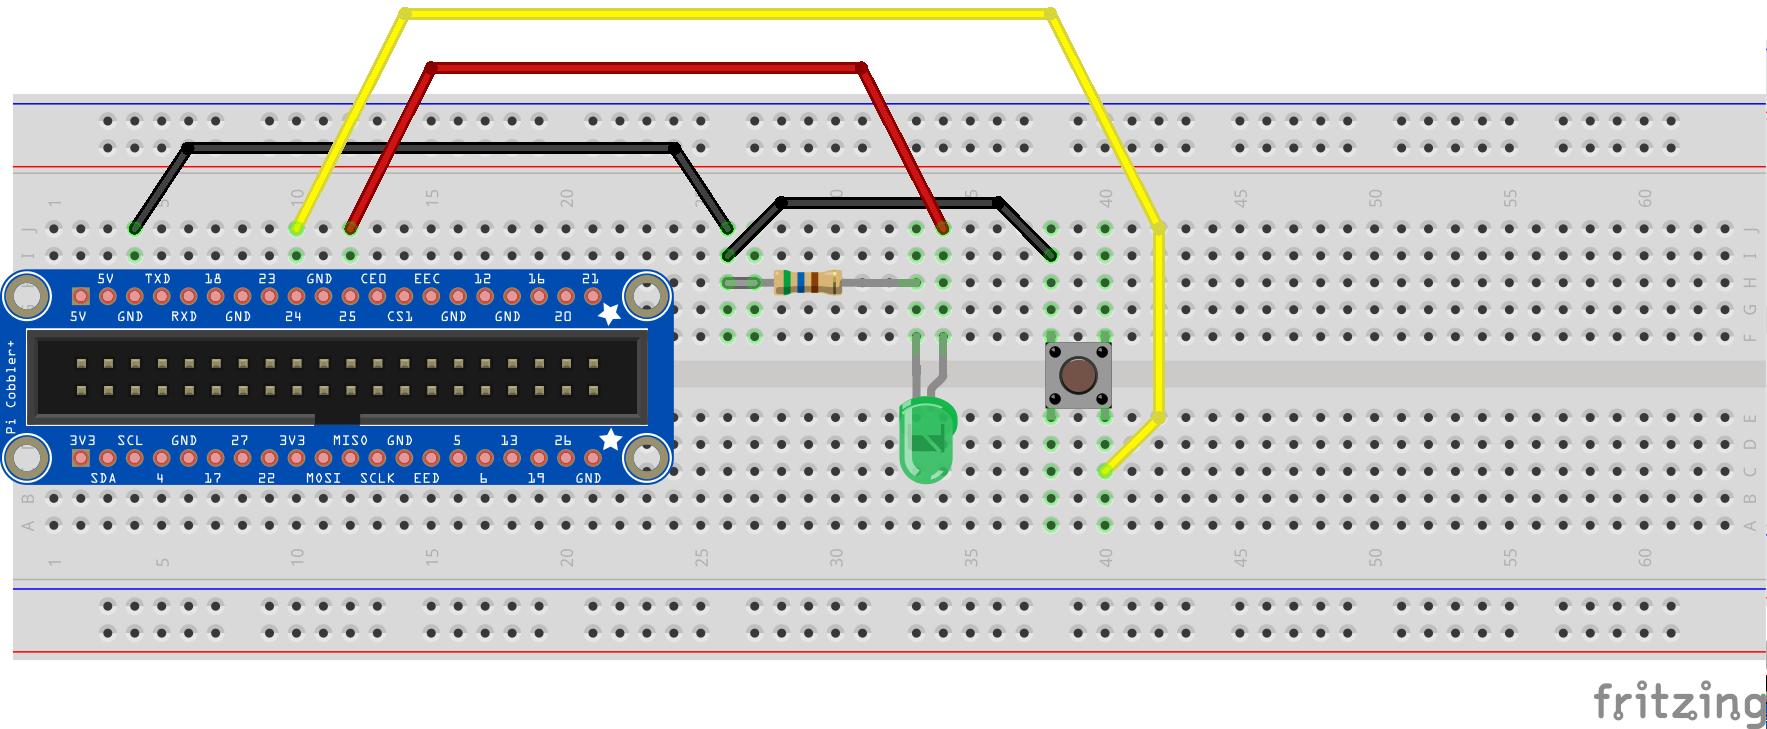 raspberry_pi_project_2_diagram_final_bb.png